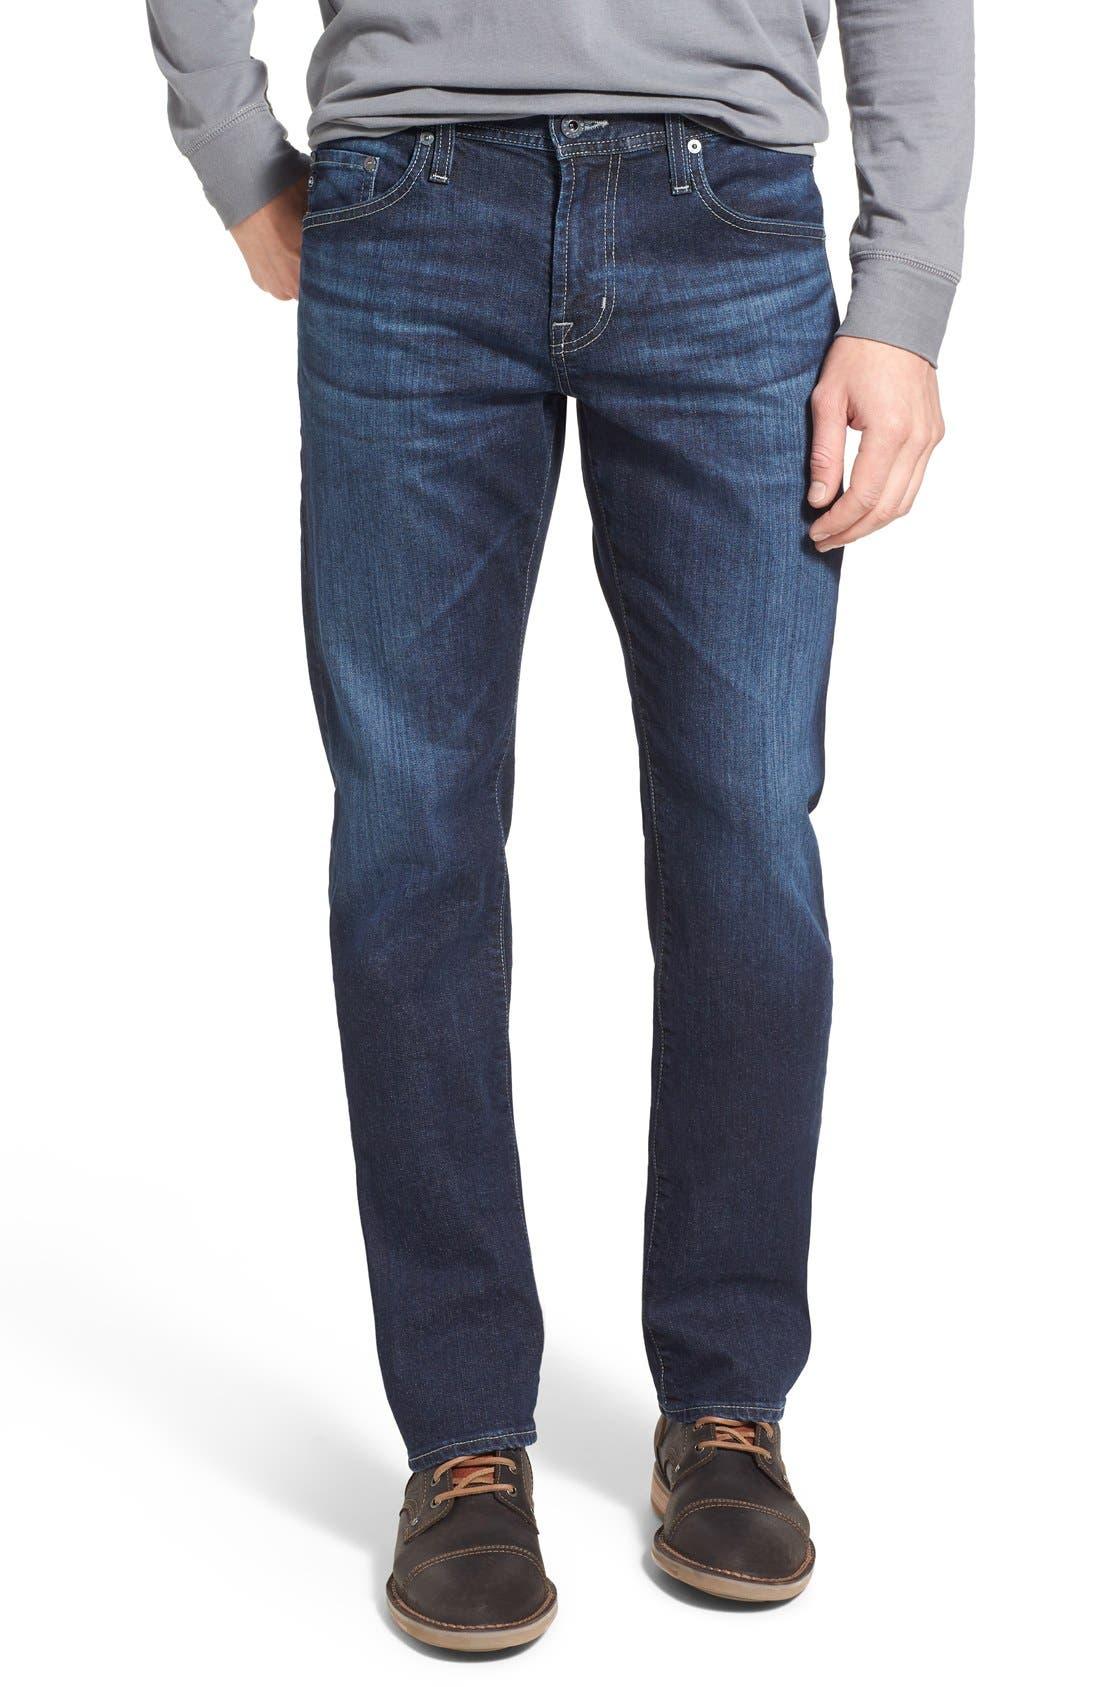 'Protégé' Straight Leg Jeans,                             Main thumbnail 1, color,                             402